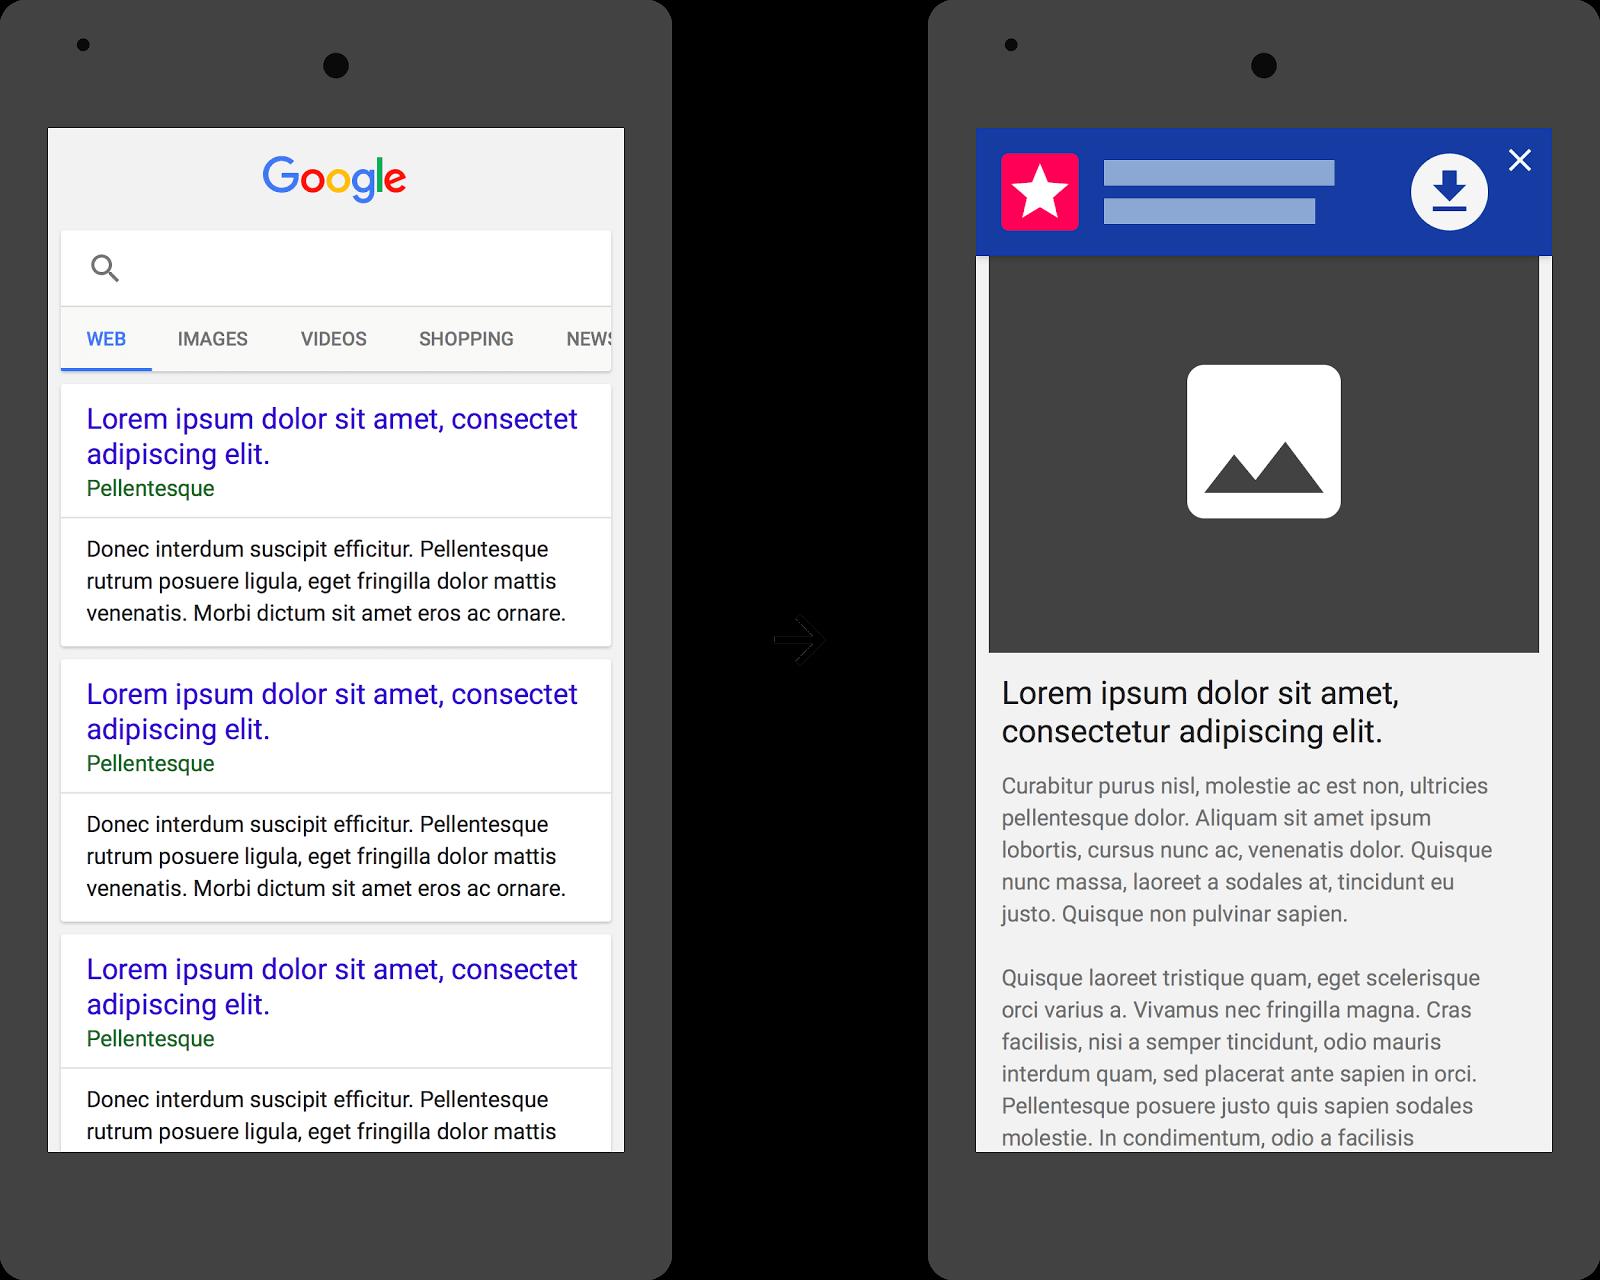 Google To Demote Websites Showing Giant Banner Ads